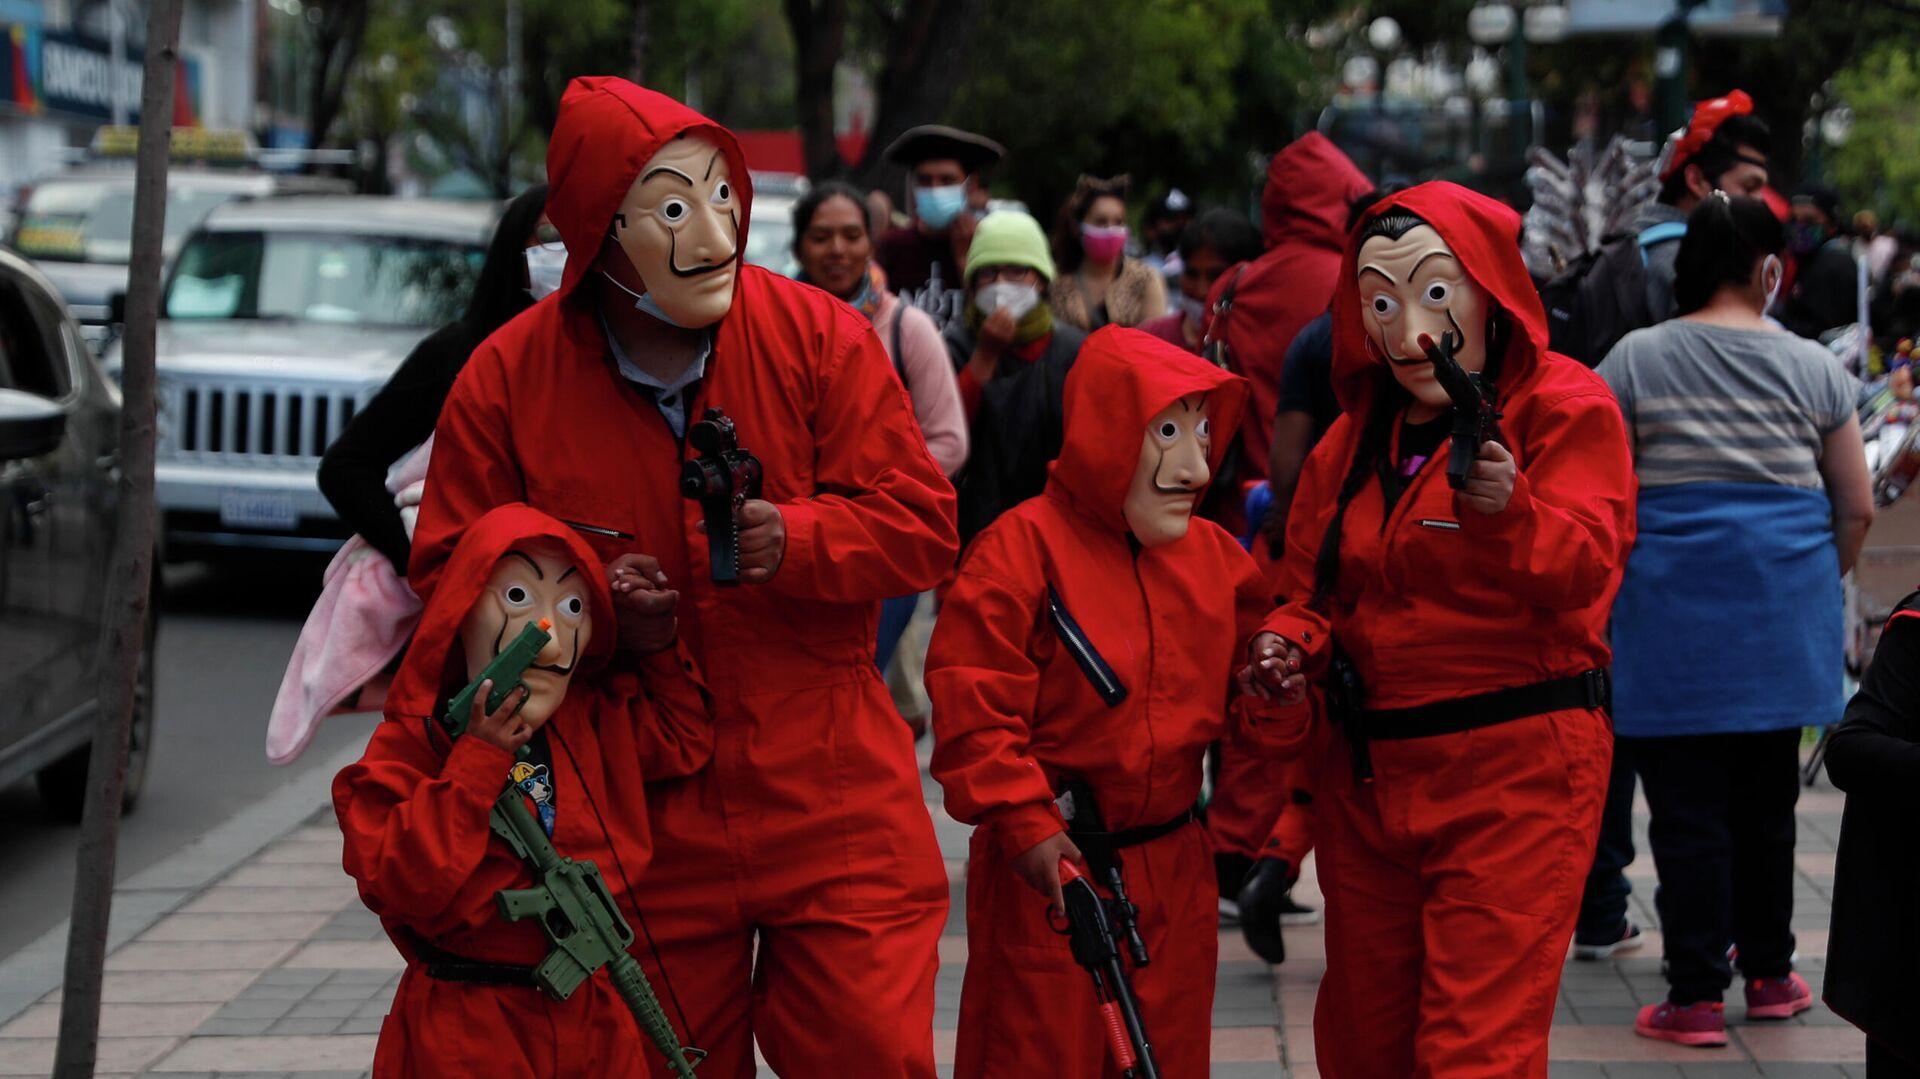 Una familia disfrazada de los personajes de La Casa del Papel en Bolivia - Sputnik Mundo, 1920, 05.06.2021